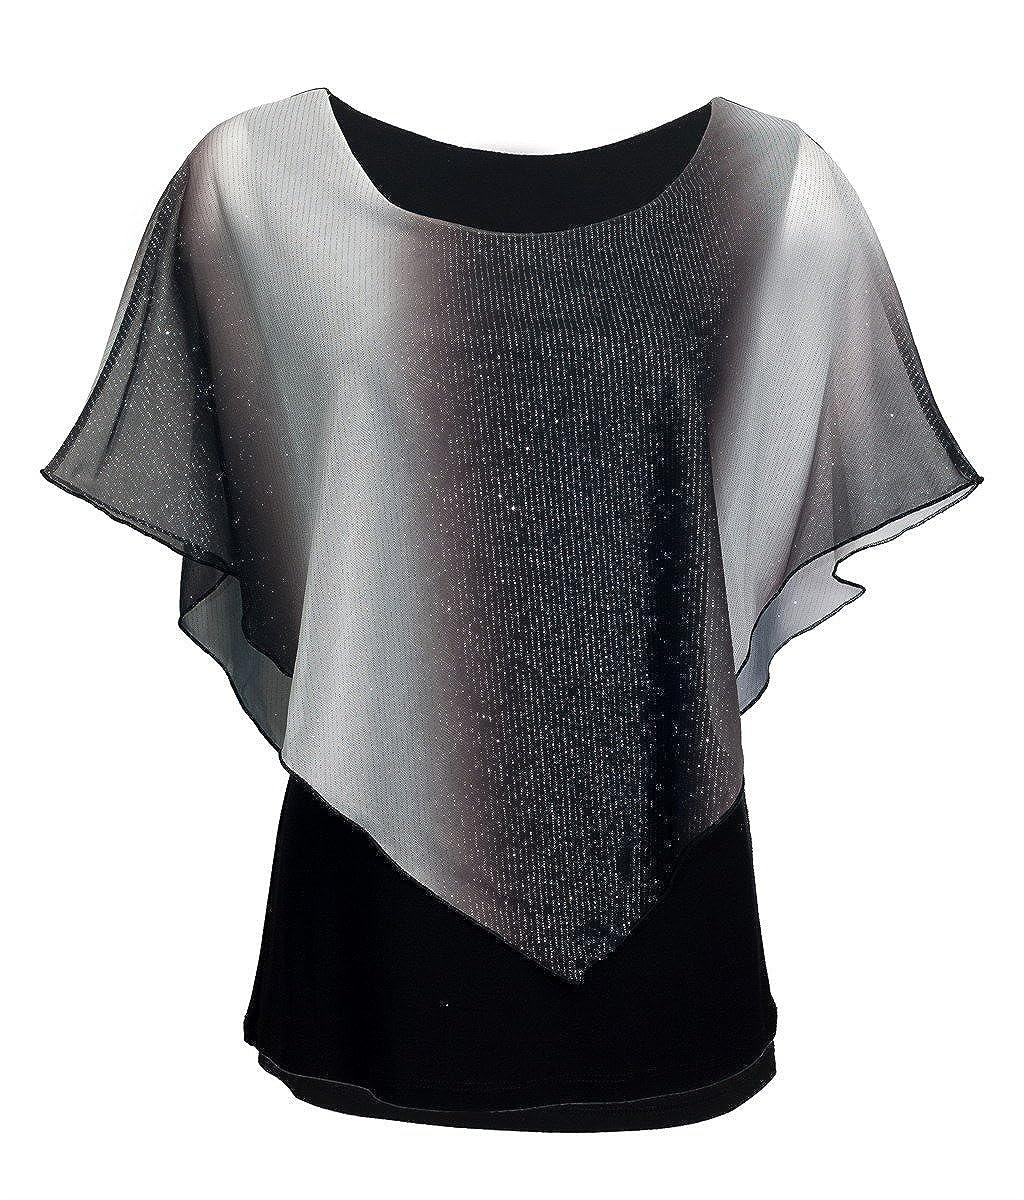 eVogues Plus Size Glitter Layered Look Poncho Top M20121124A_BLU